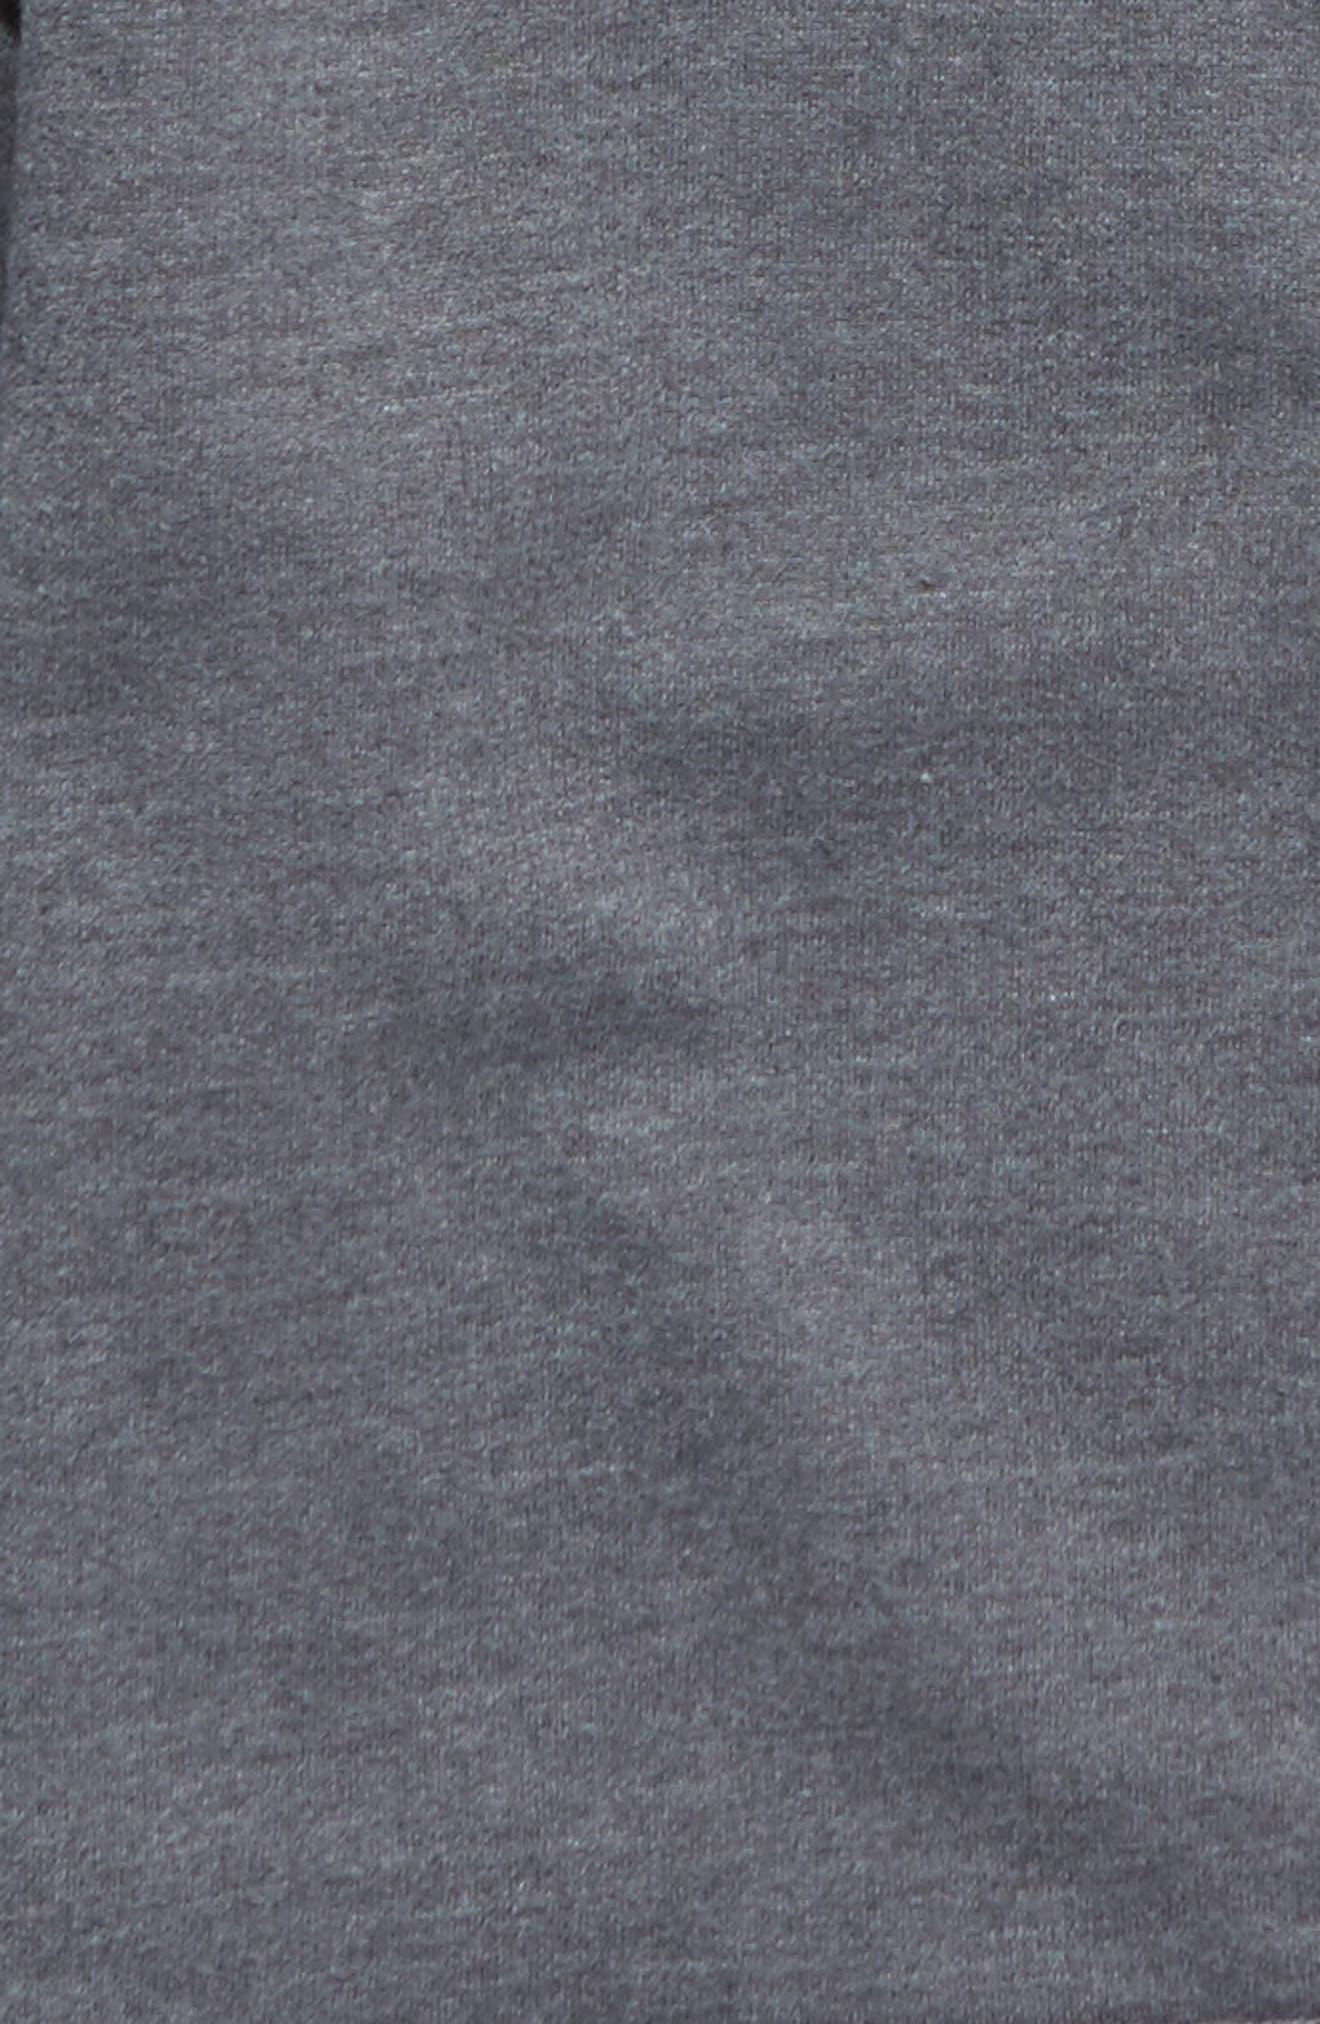 Zip-Up Hooded Sweatshirt,                             Alternate thumbnail 2, color,                             030